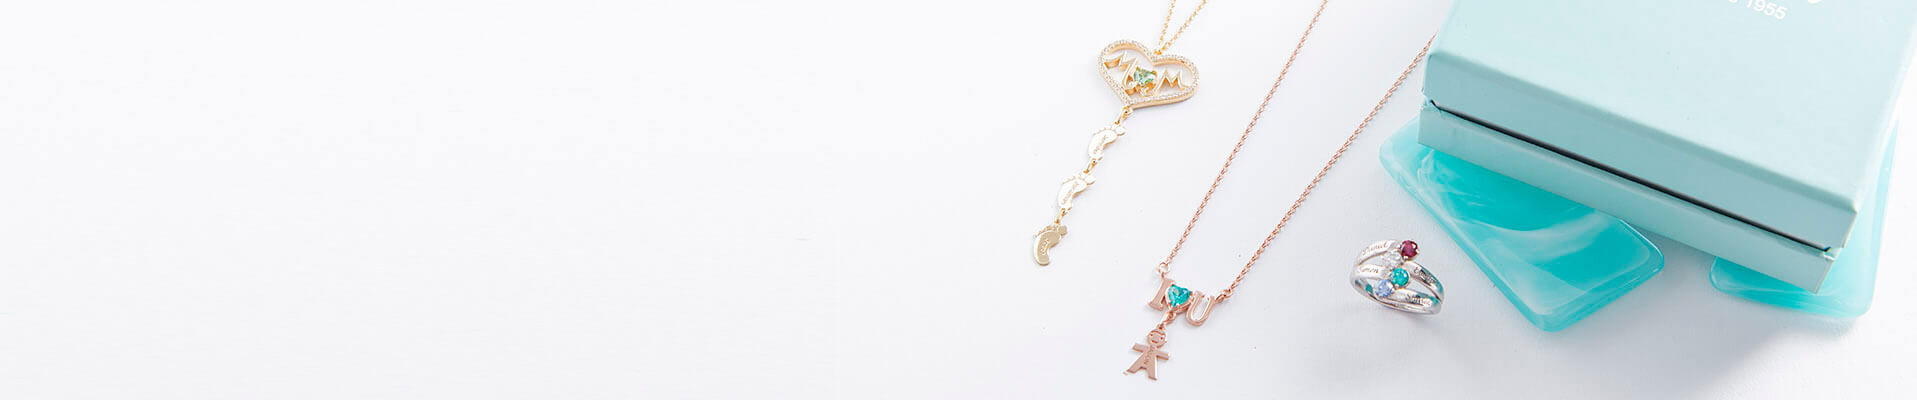 Pierres de naissance jewelry mom web banner